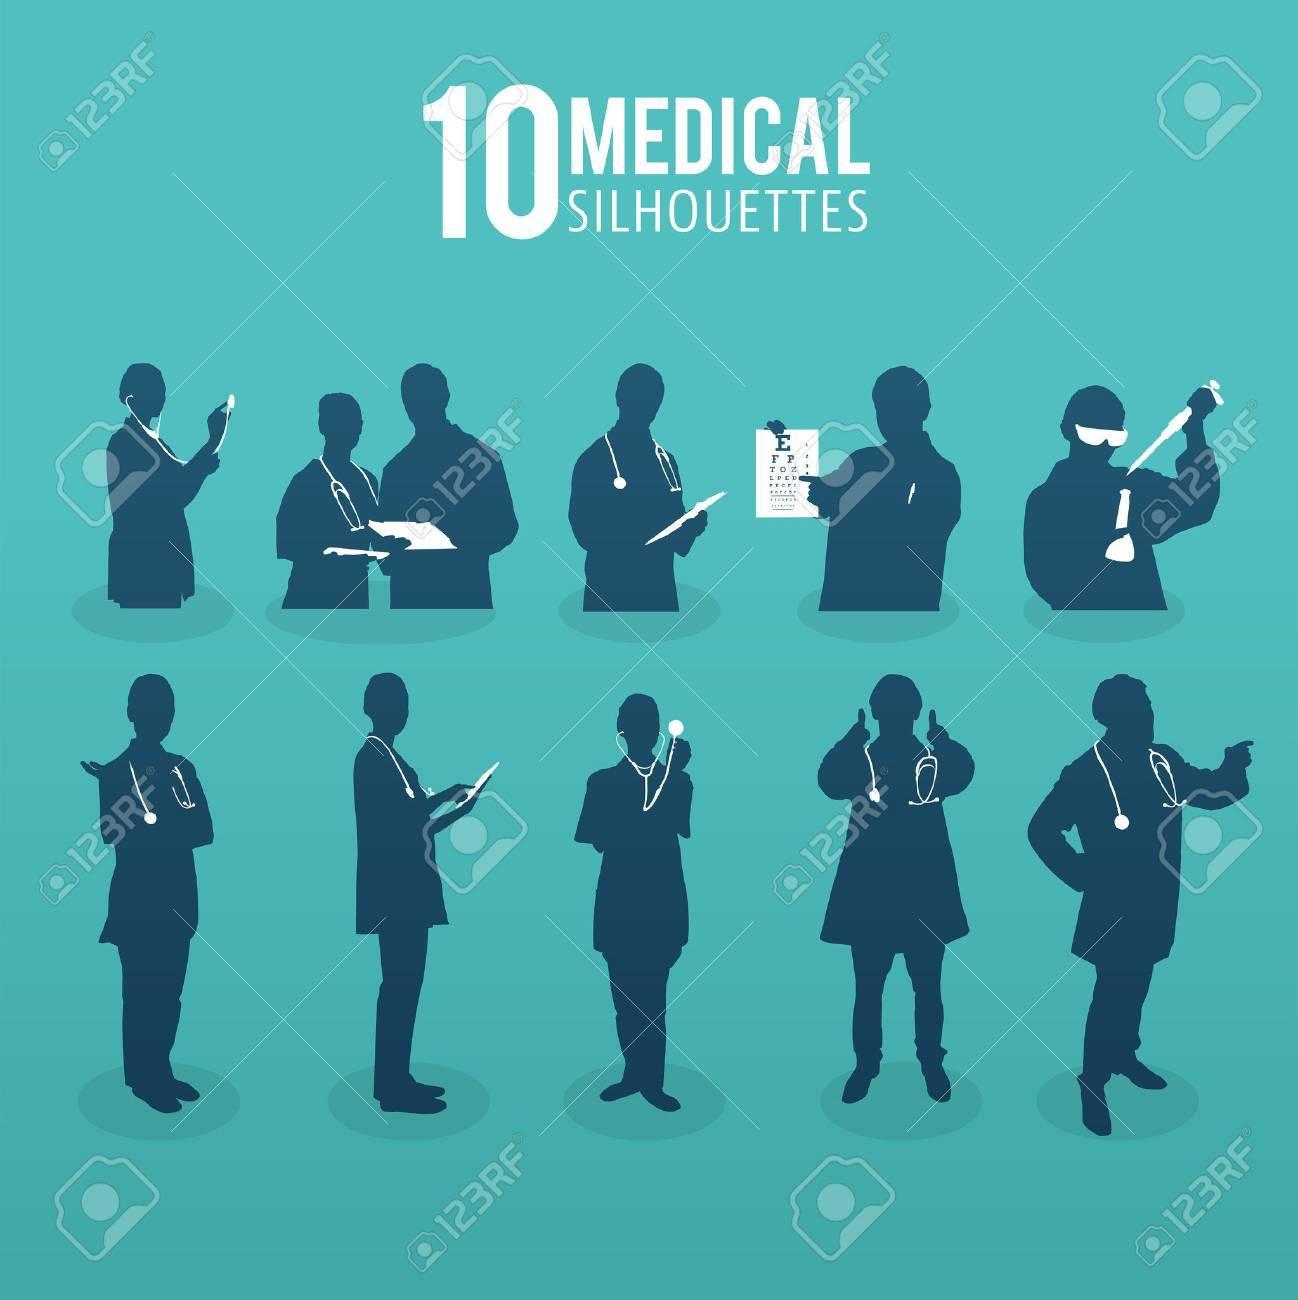 Digitally generated Ten medical silhouettes vector Stock Vector - 38673117